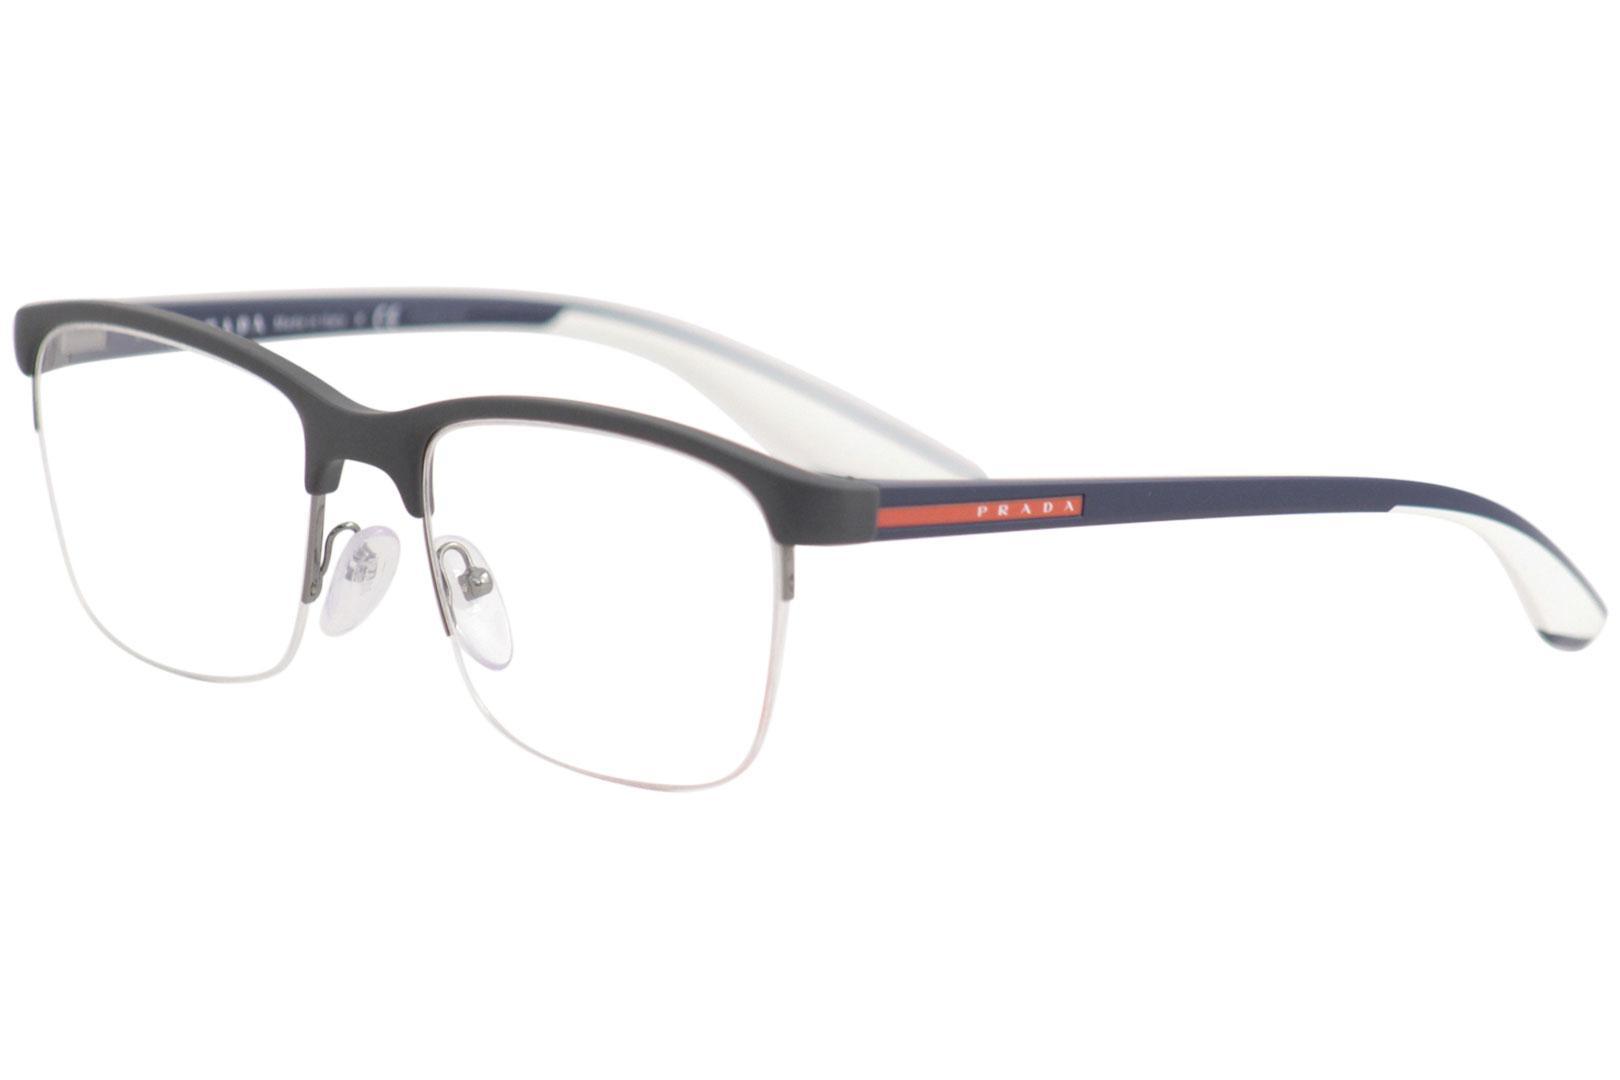 140bd38c59e Prada Linea Rossa Men s Eyeglasses VPS02L VPS 02 L Half Rim Optical ...